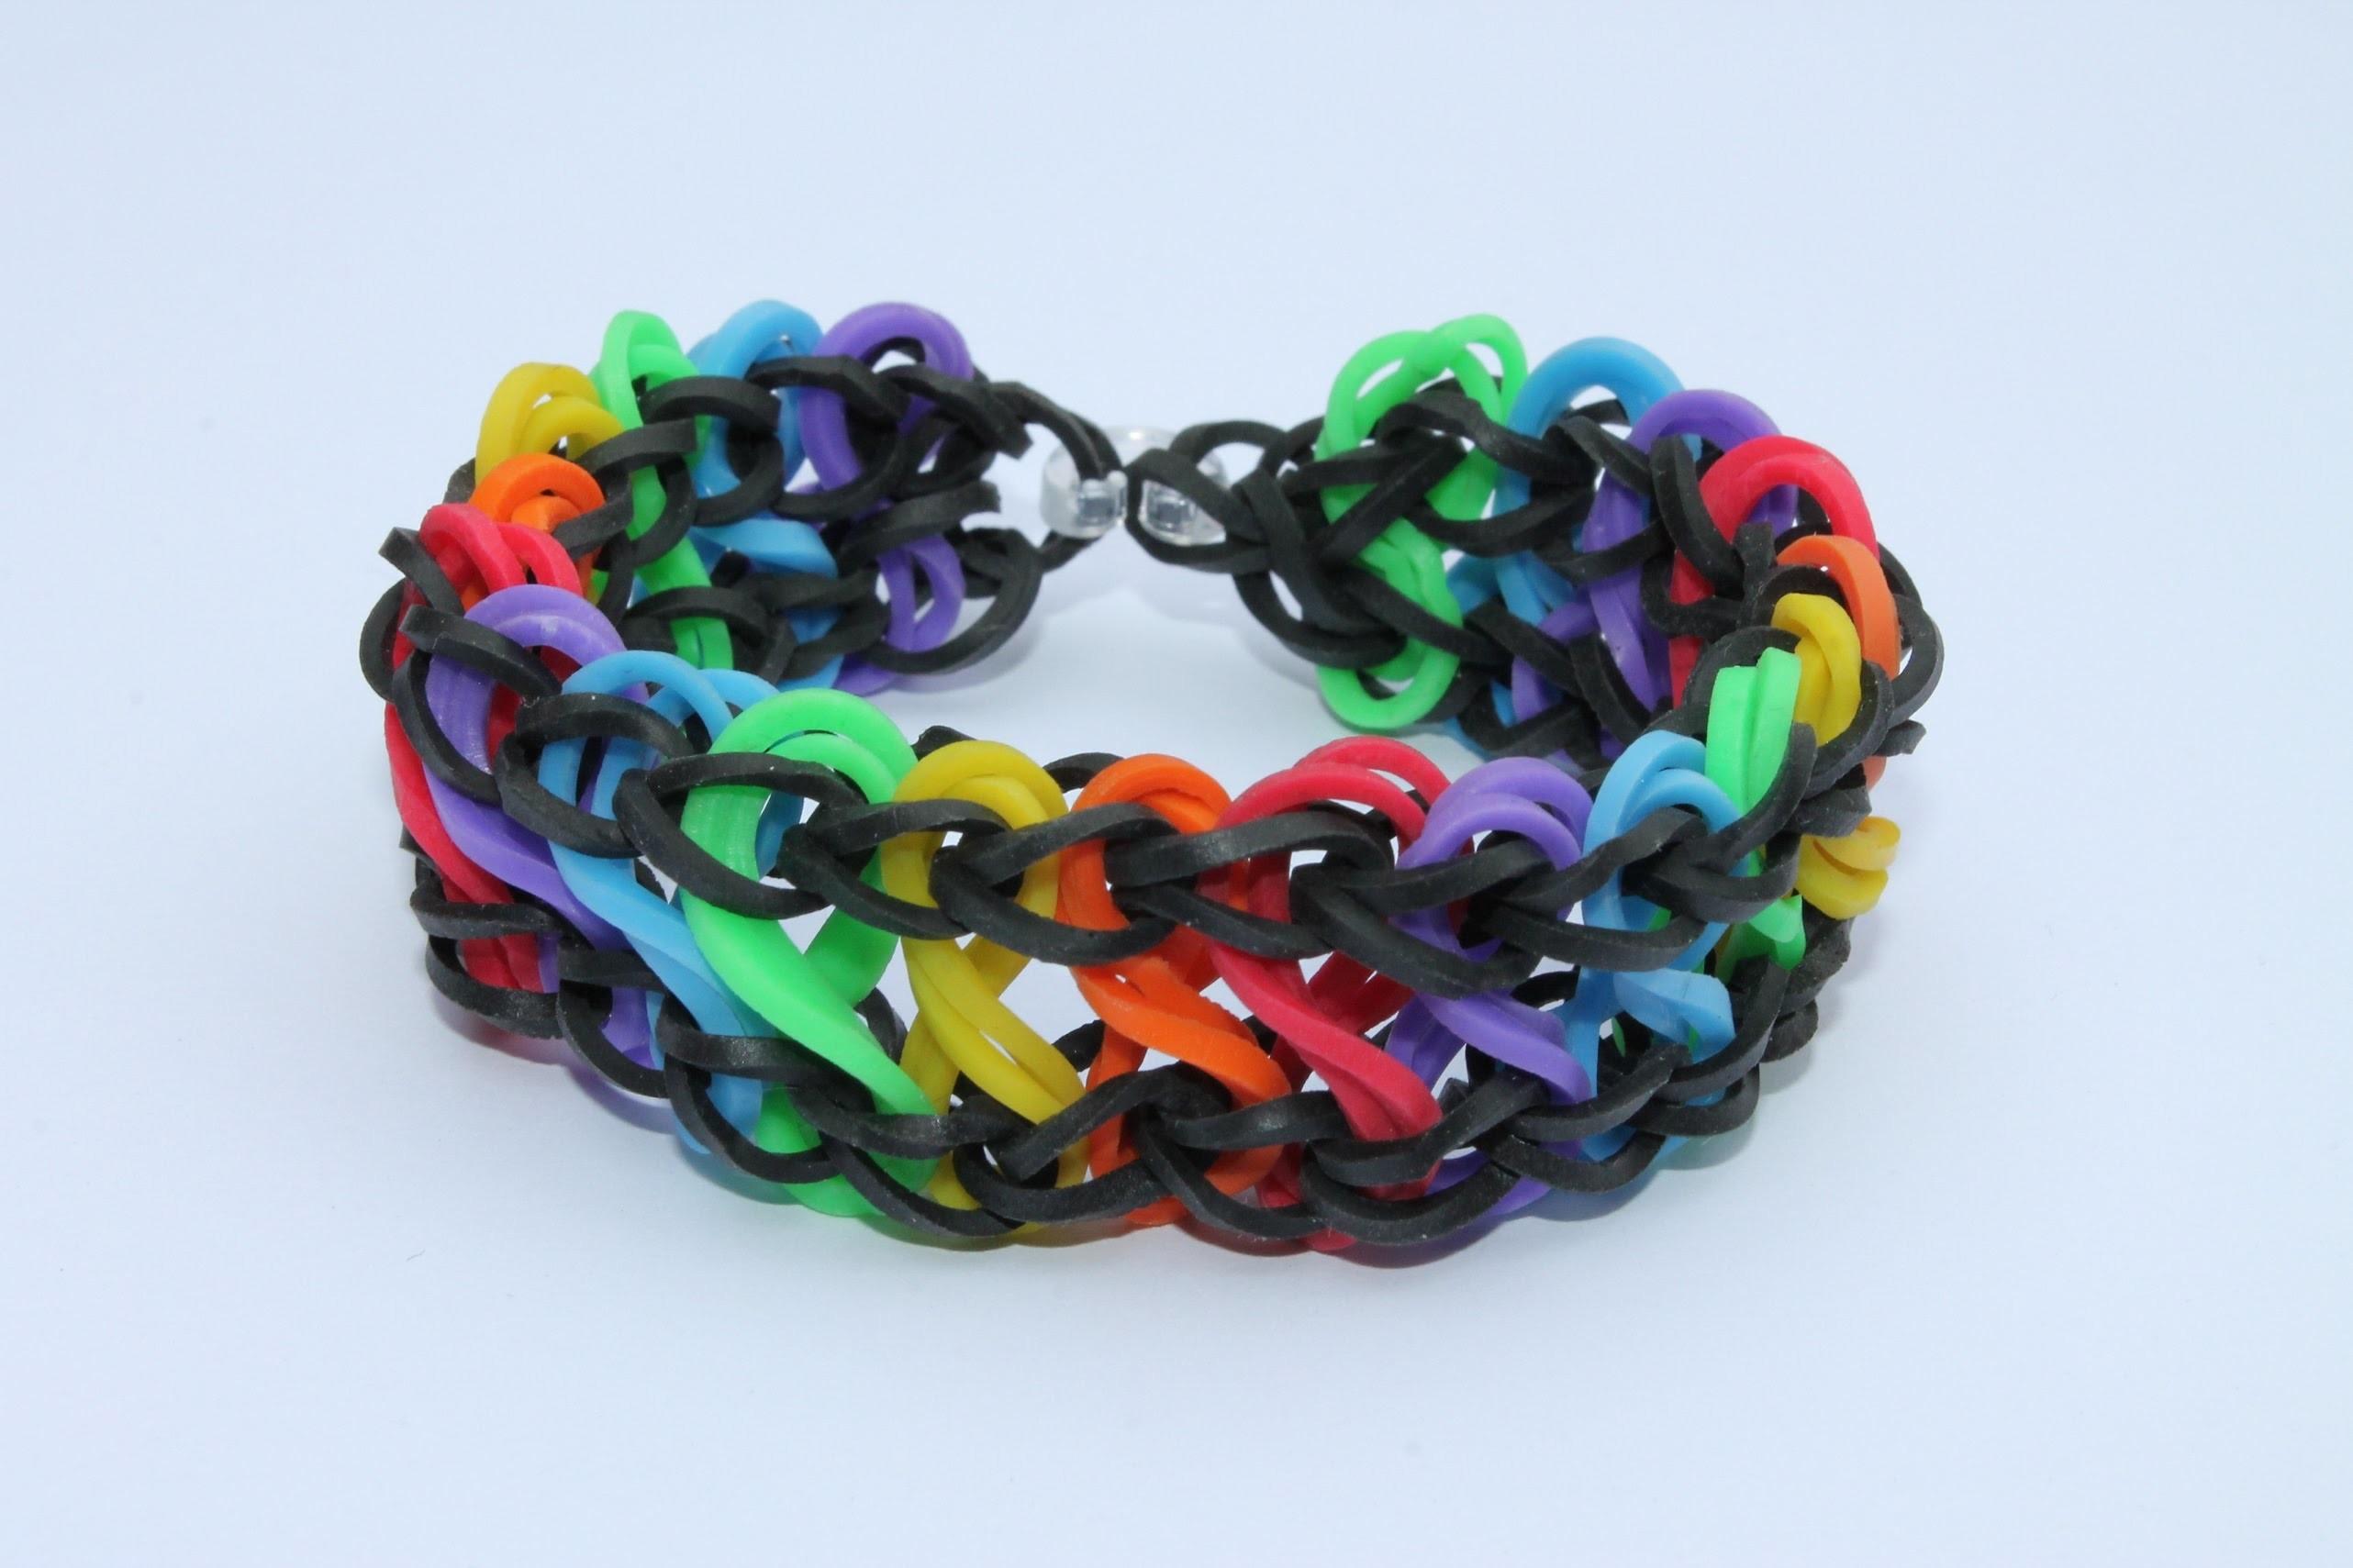 Rainbow Loom Nederlands, Double Infinity Rondom, 1 loom, Full